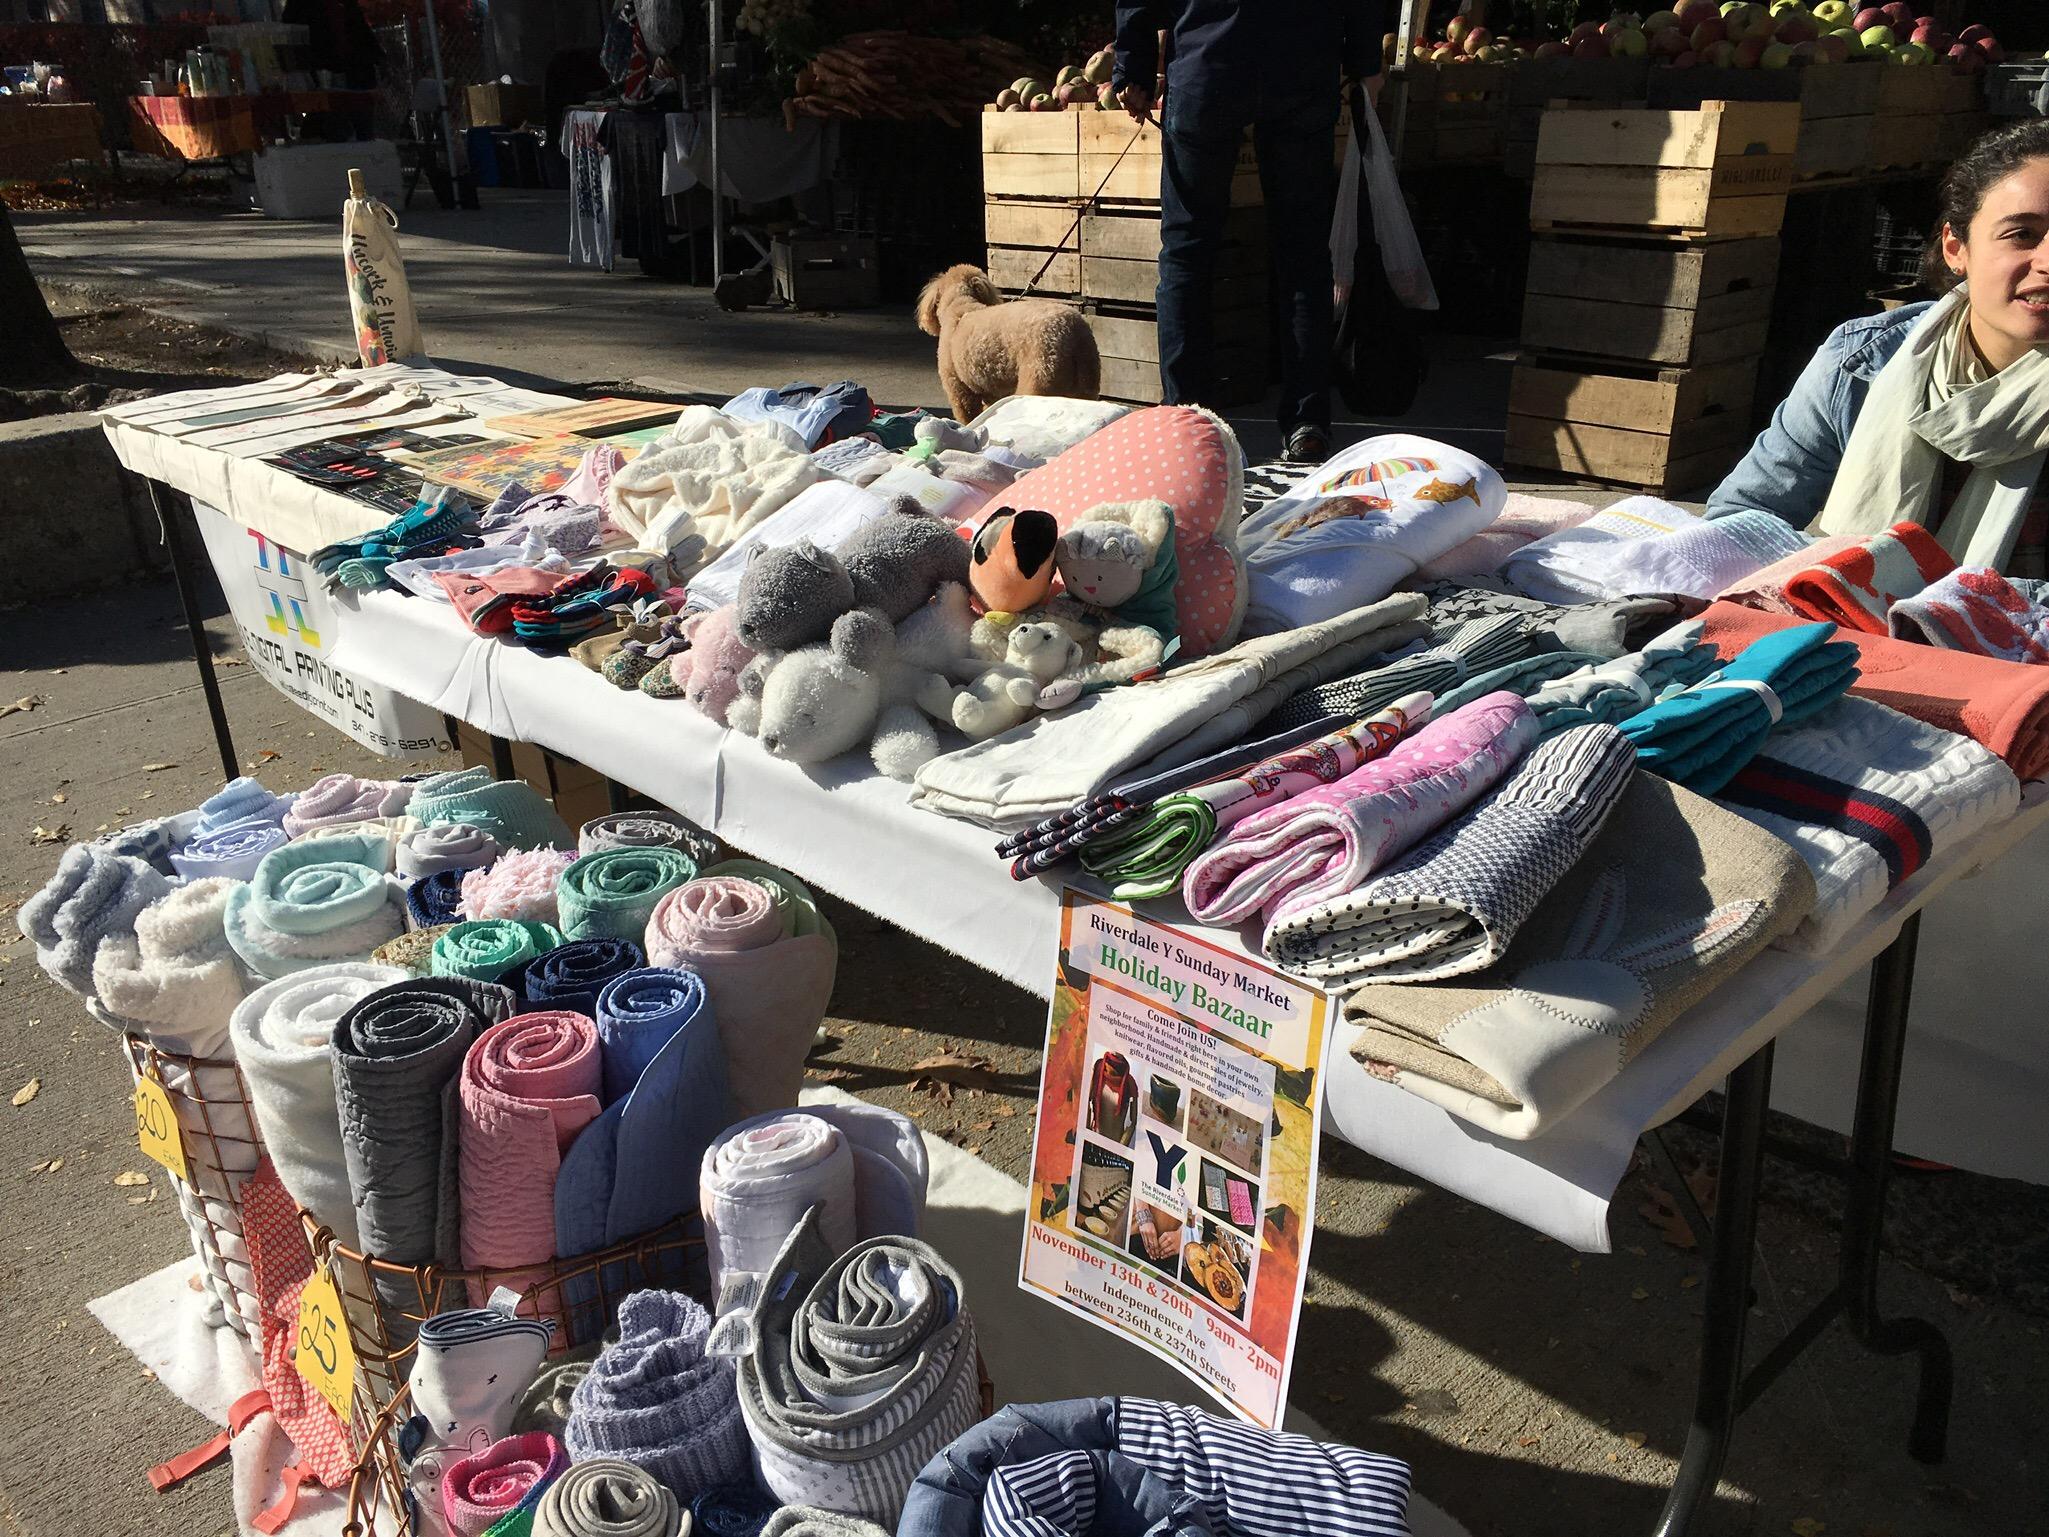 Sunday Market - The Riverdale Y